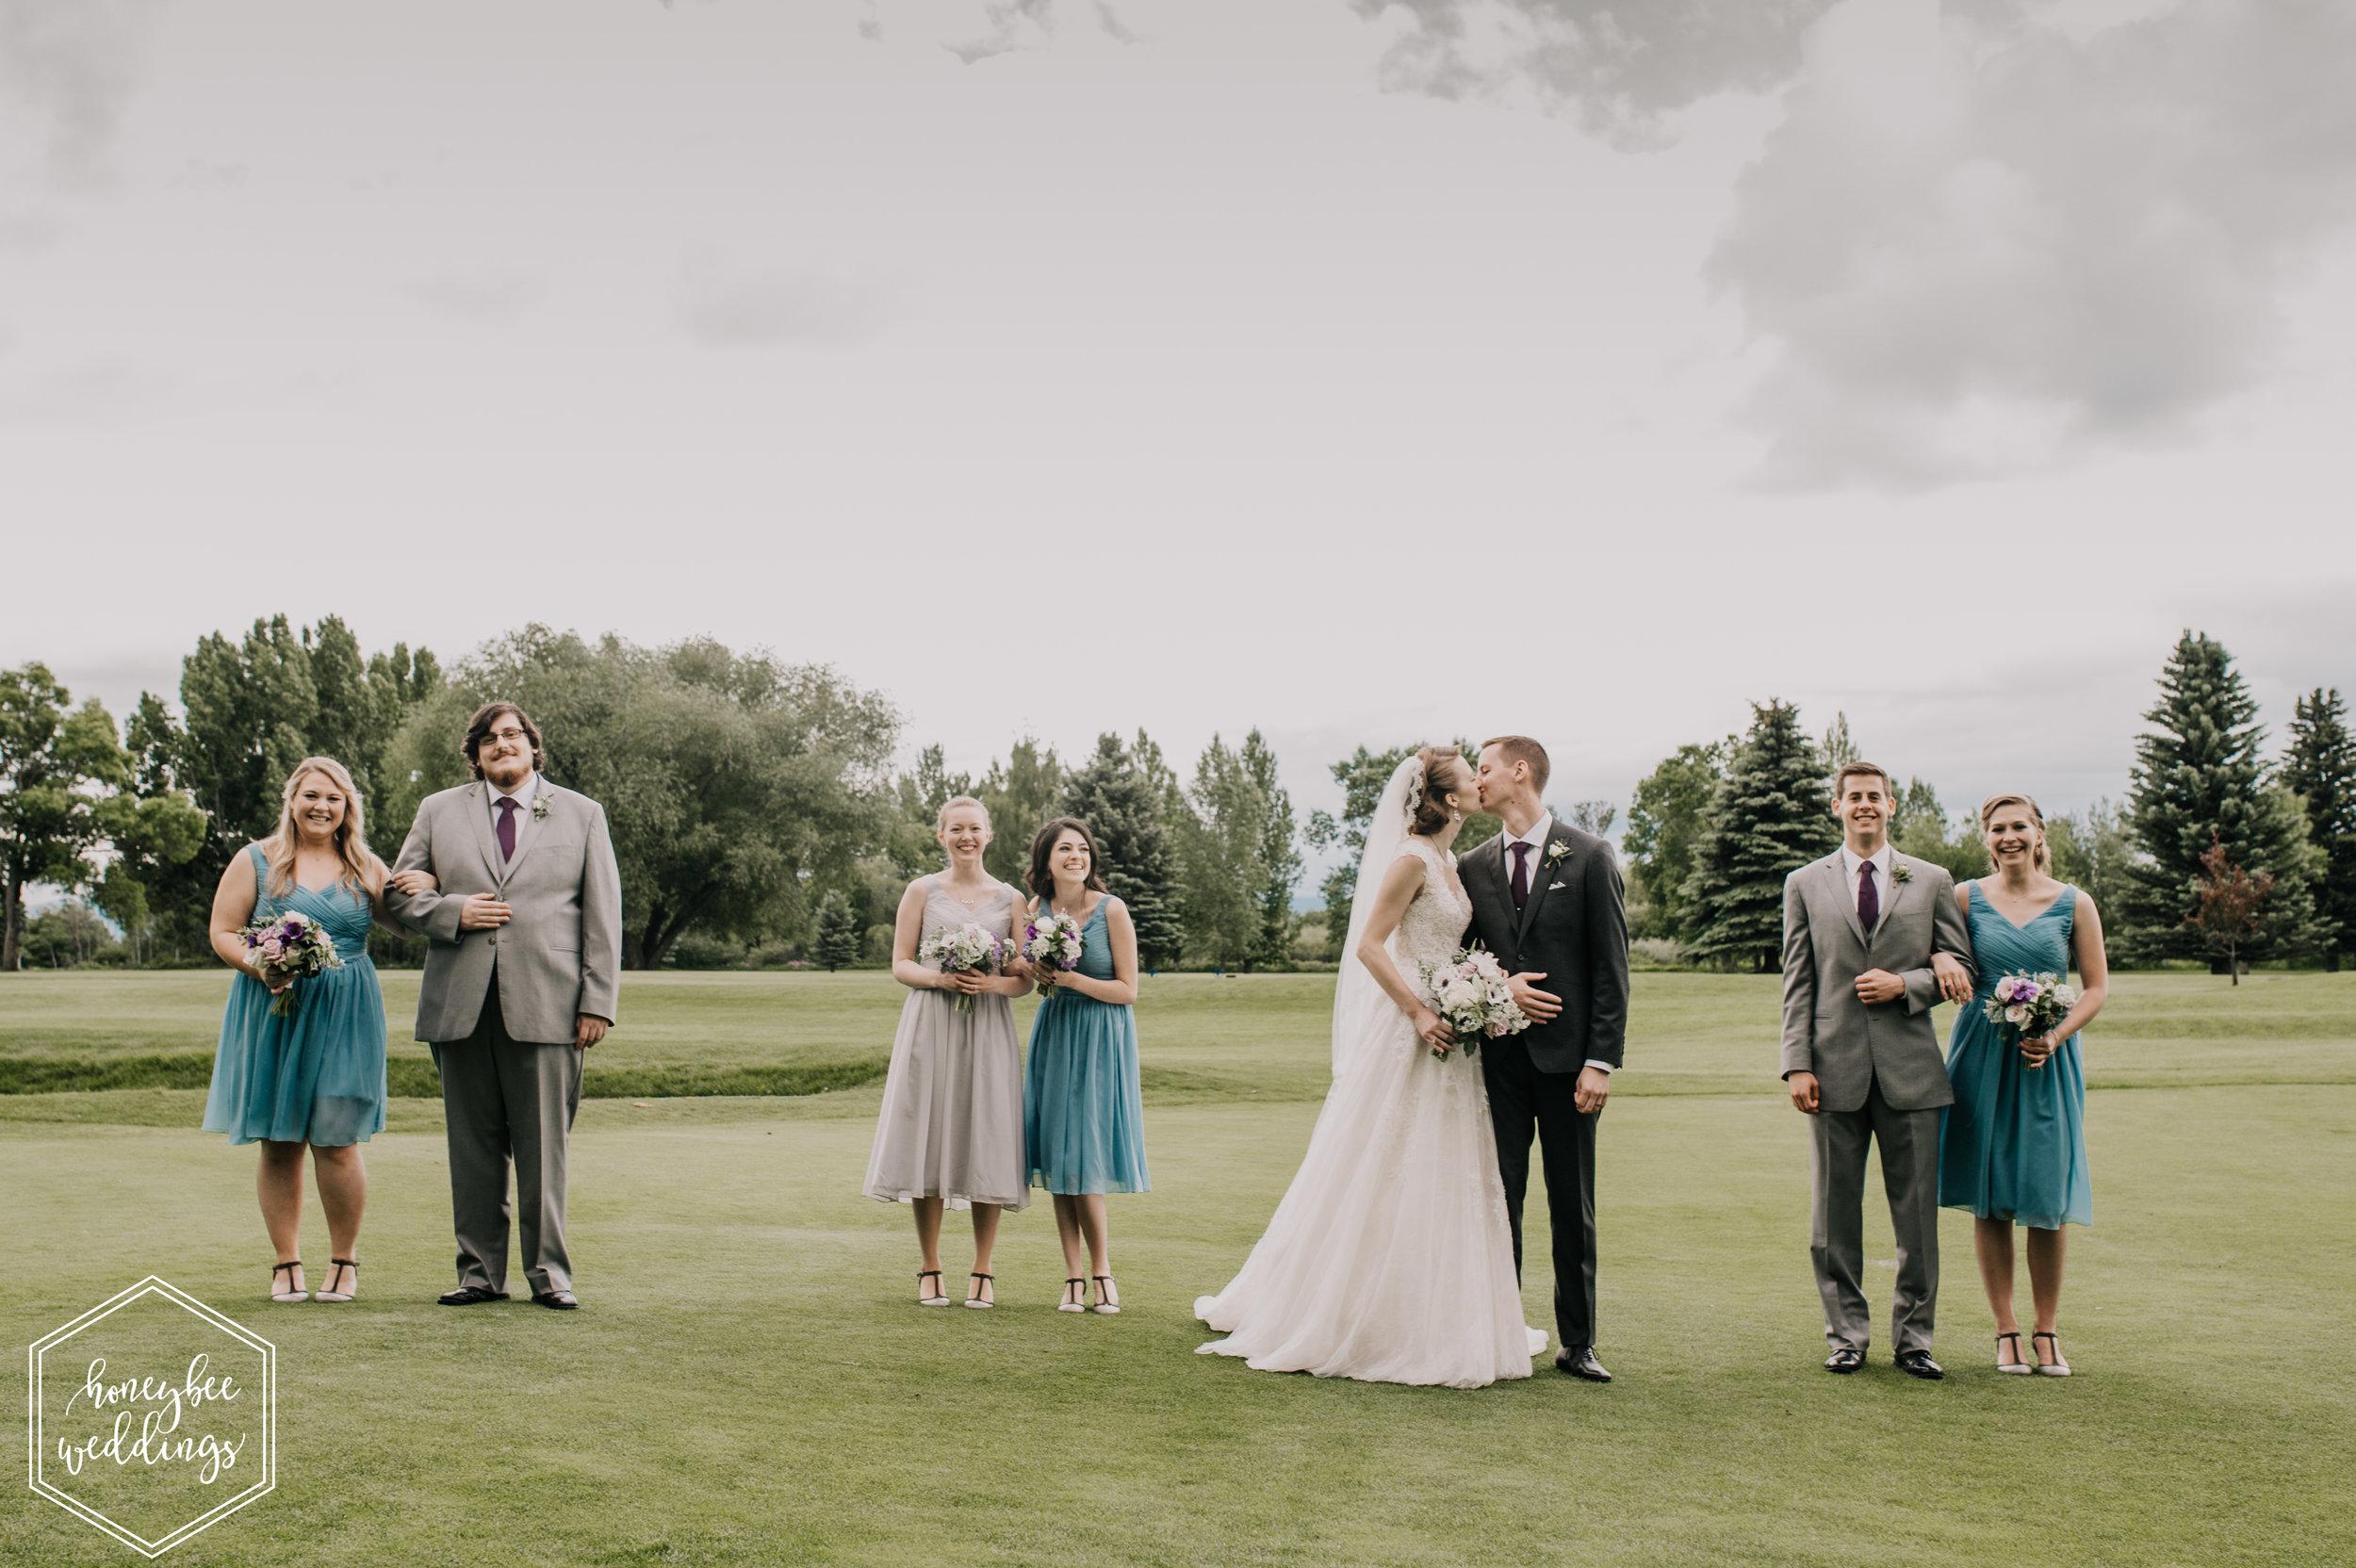 743 Riverside Country Club Wedding_Montana Wedding Photographer_Lauren Jackson + Evan Ivaldi 2018-8249.jpg